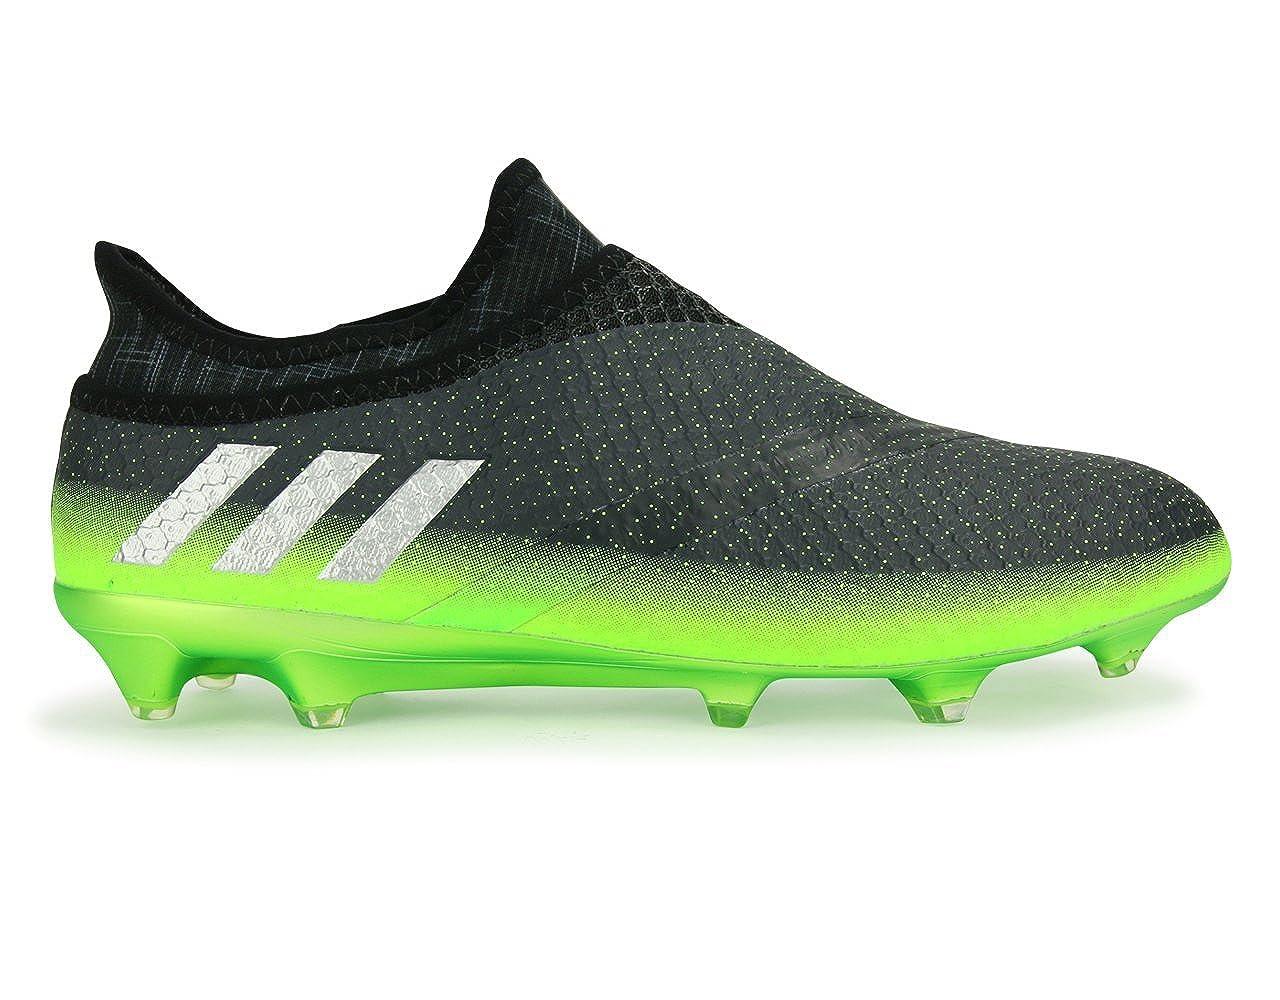 - adidas Men's Messi 16+ PUREAGILITY FG Dark gris argent Metalic Solar vert chaussures - 8.5A